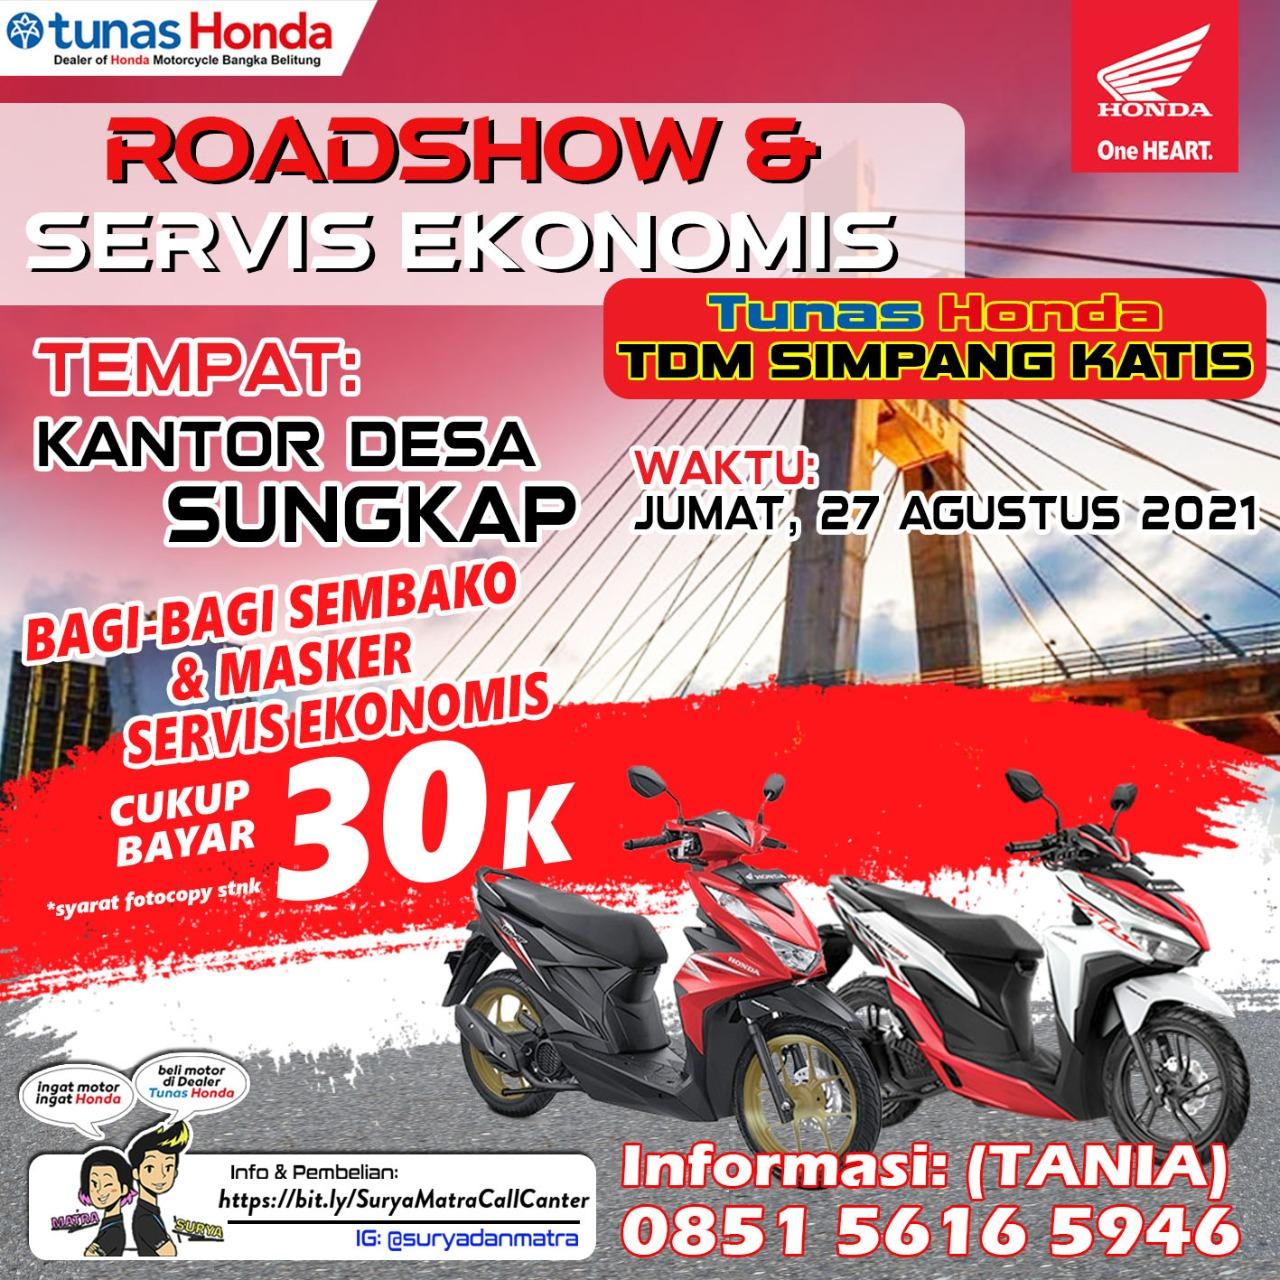 Roadshow & Servis Ekonomis TDM Simpang Katis Hanya bayar 30k